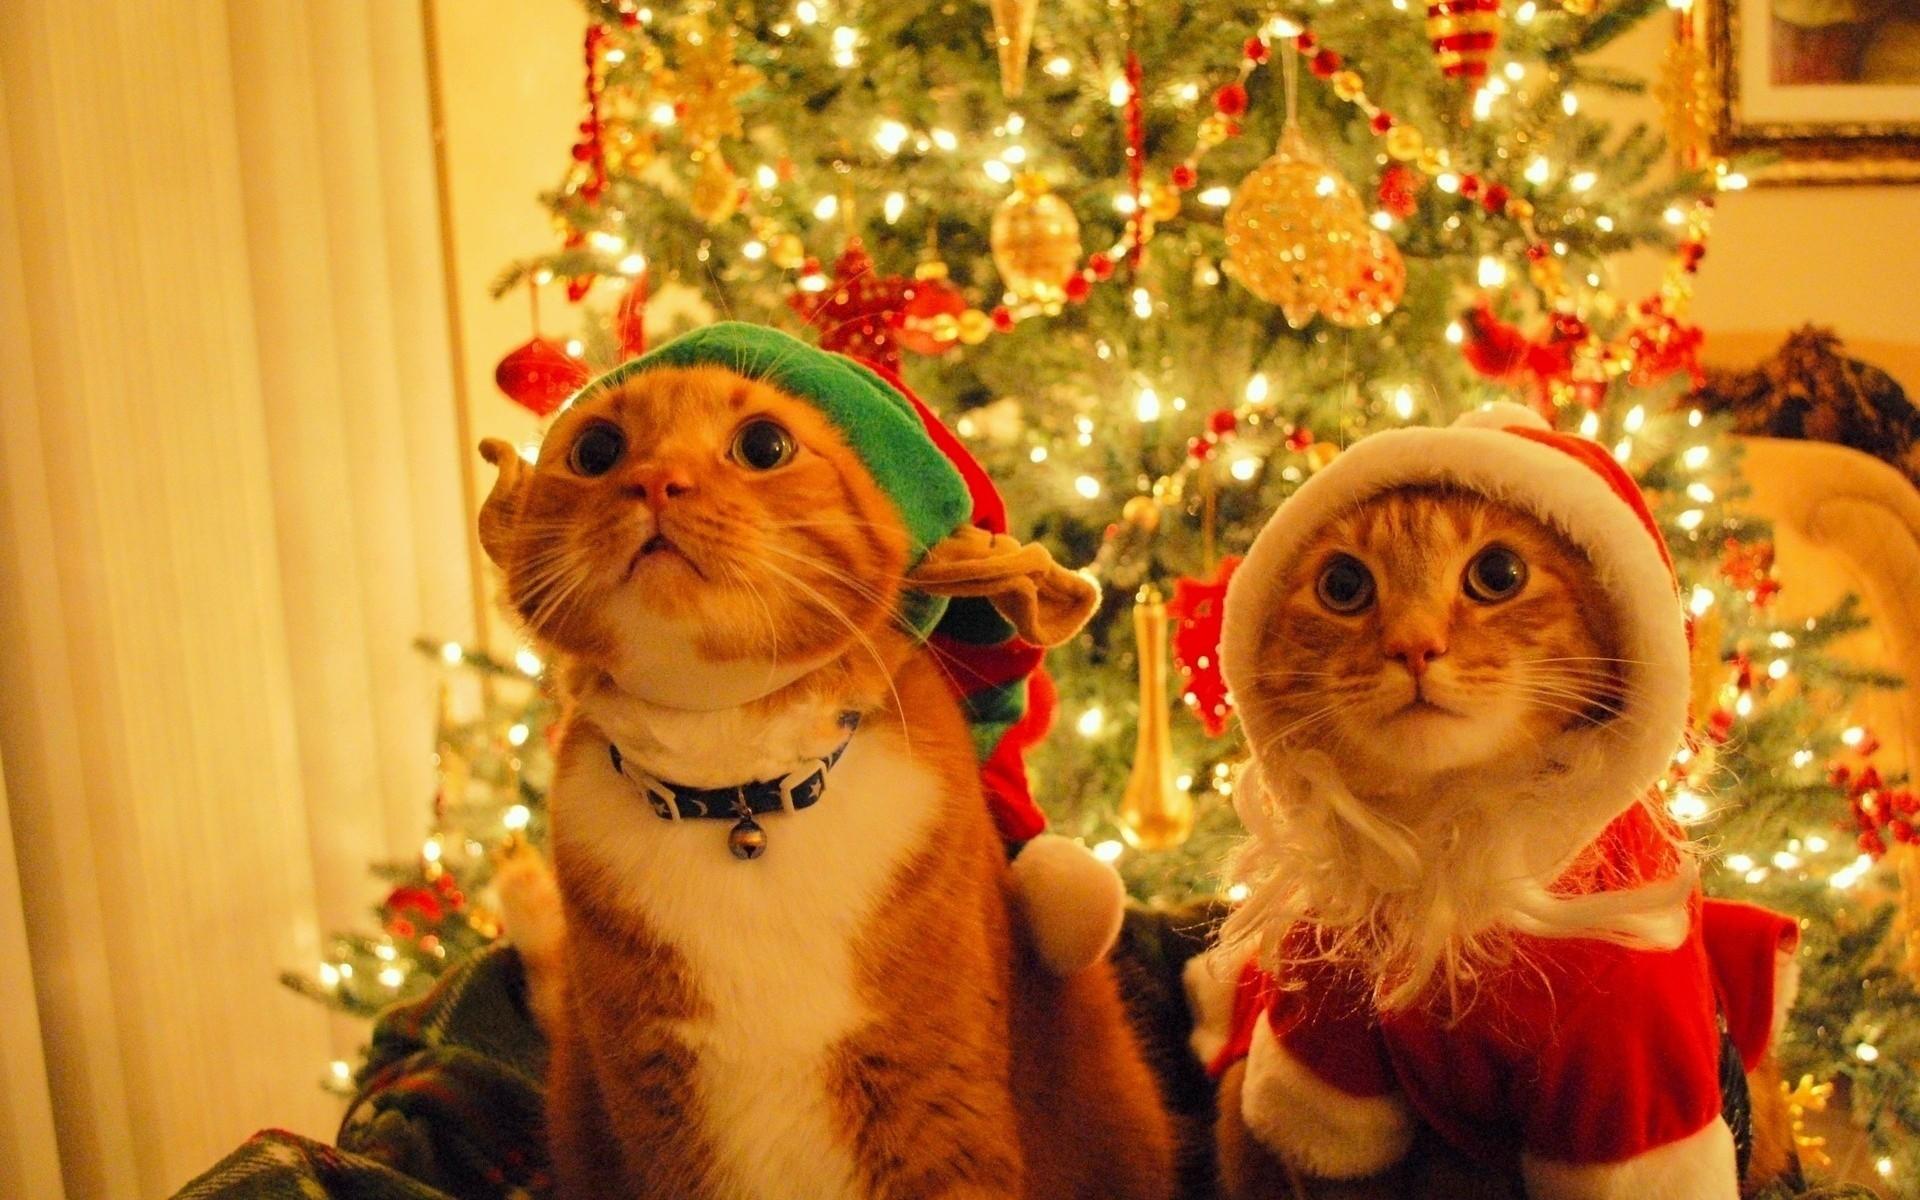 Gatos con gorras de navidad - 1920x1200